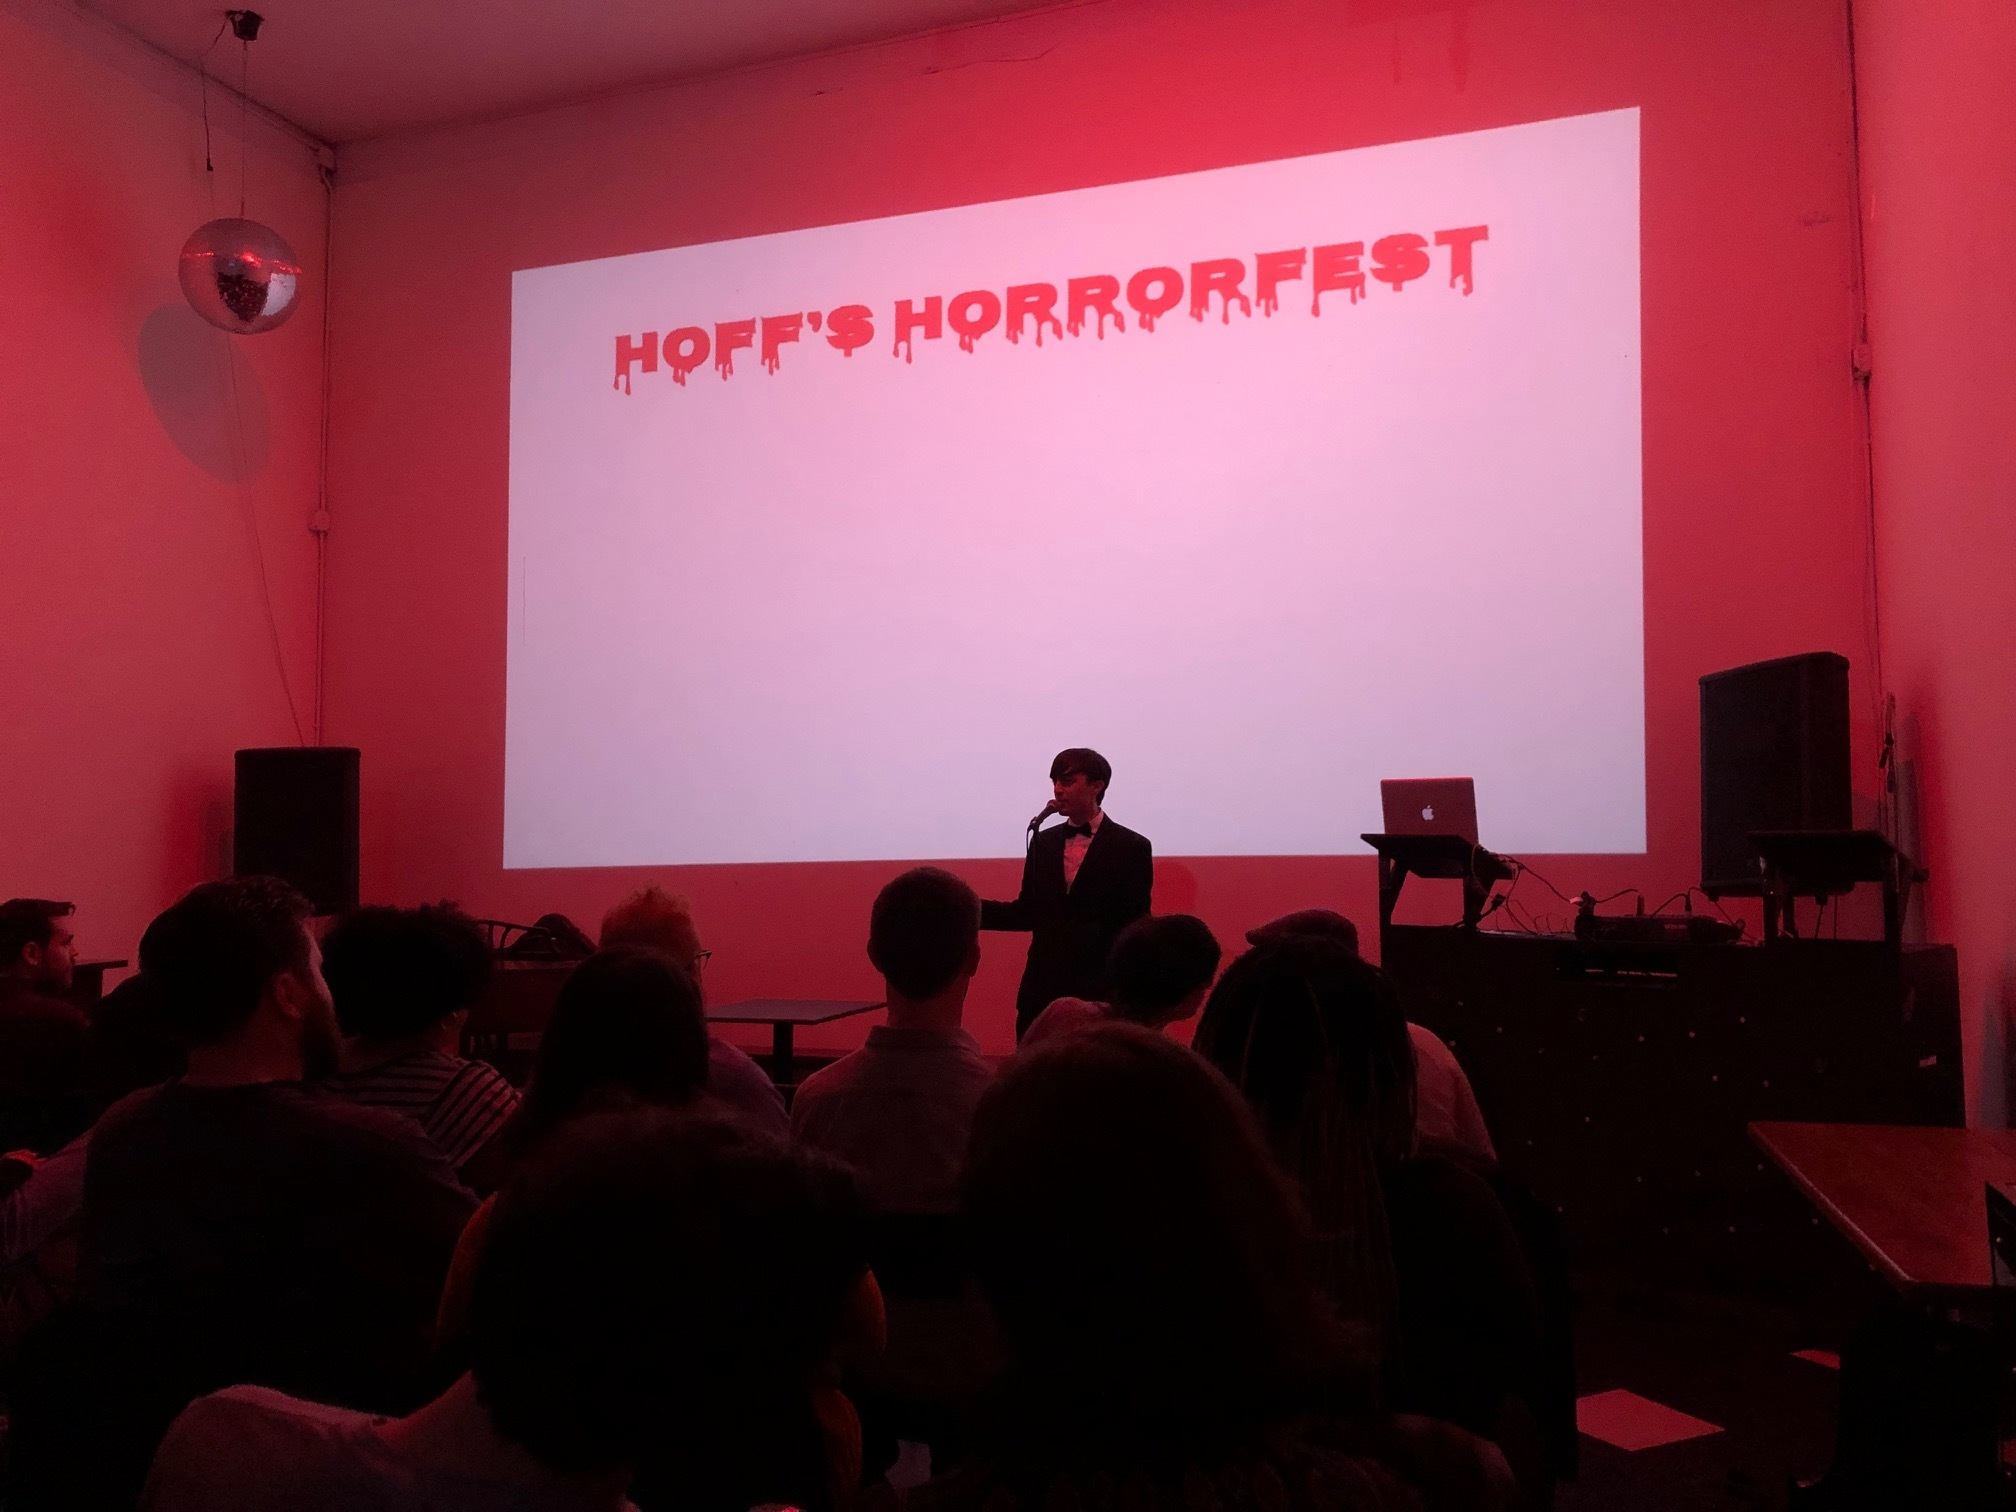 Hoff's Horrorfest